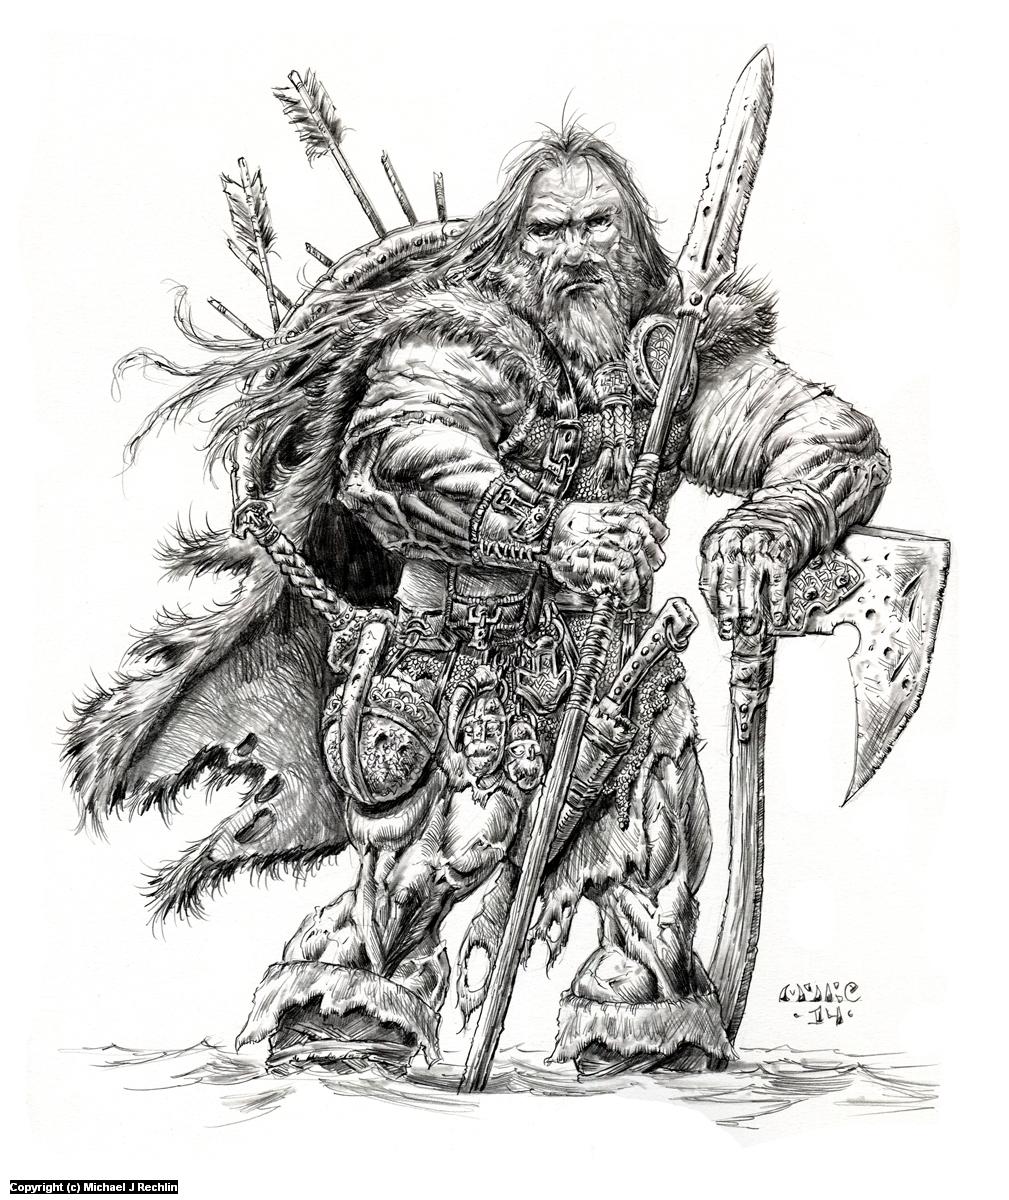 Viking Artwork by Michael Rechlin